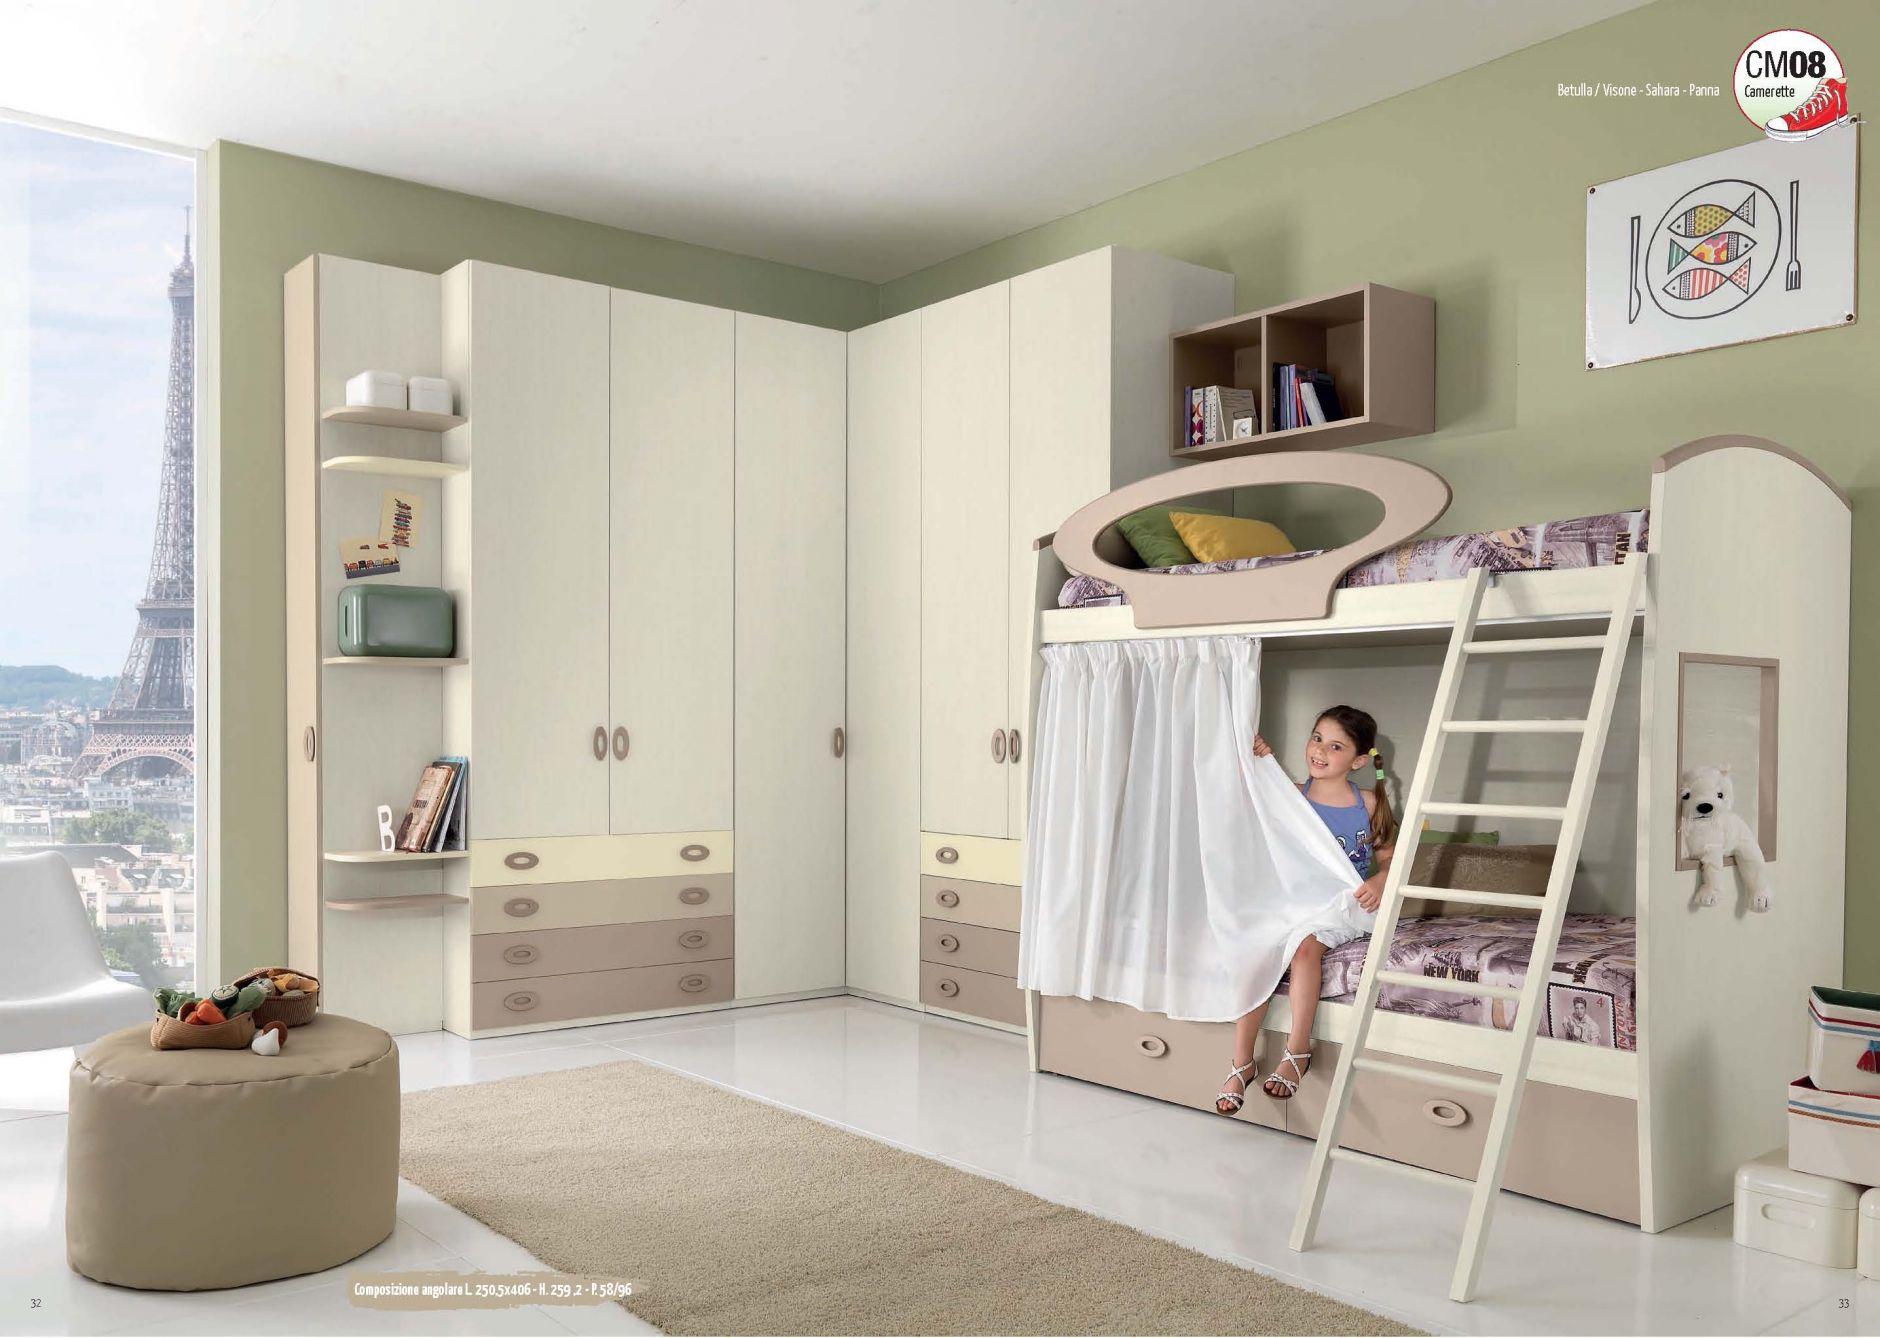 Muebles De Los Ni Os Muebles Giessegi Composici N Sm08  # Giessegi Muebles Infantil